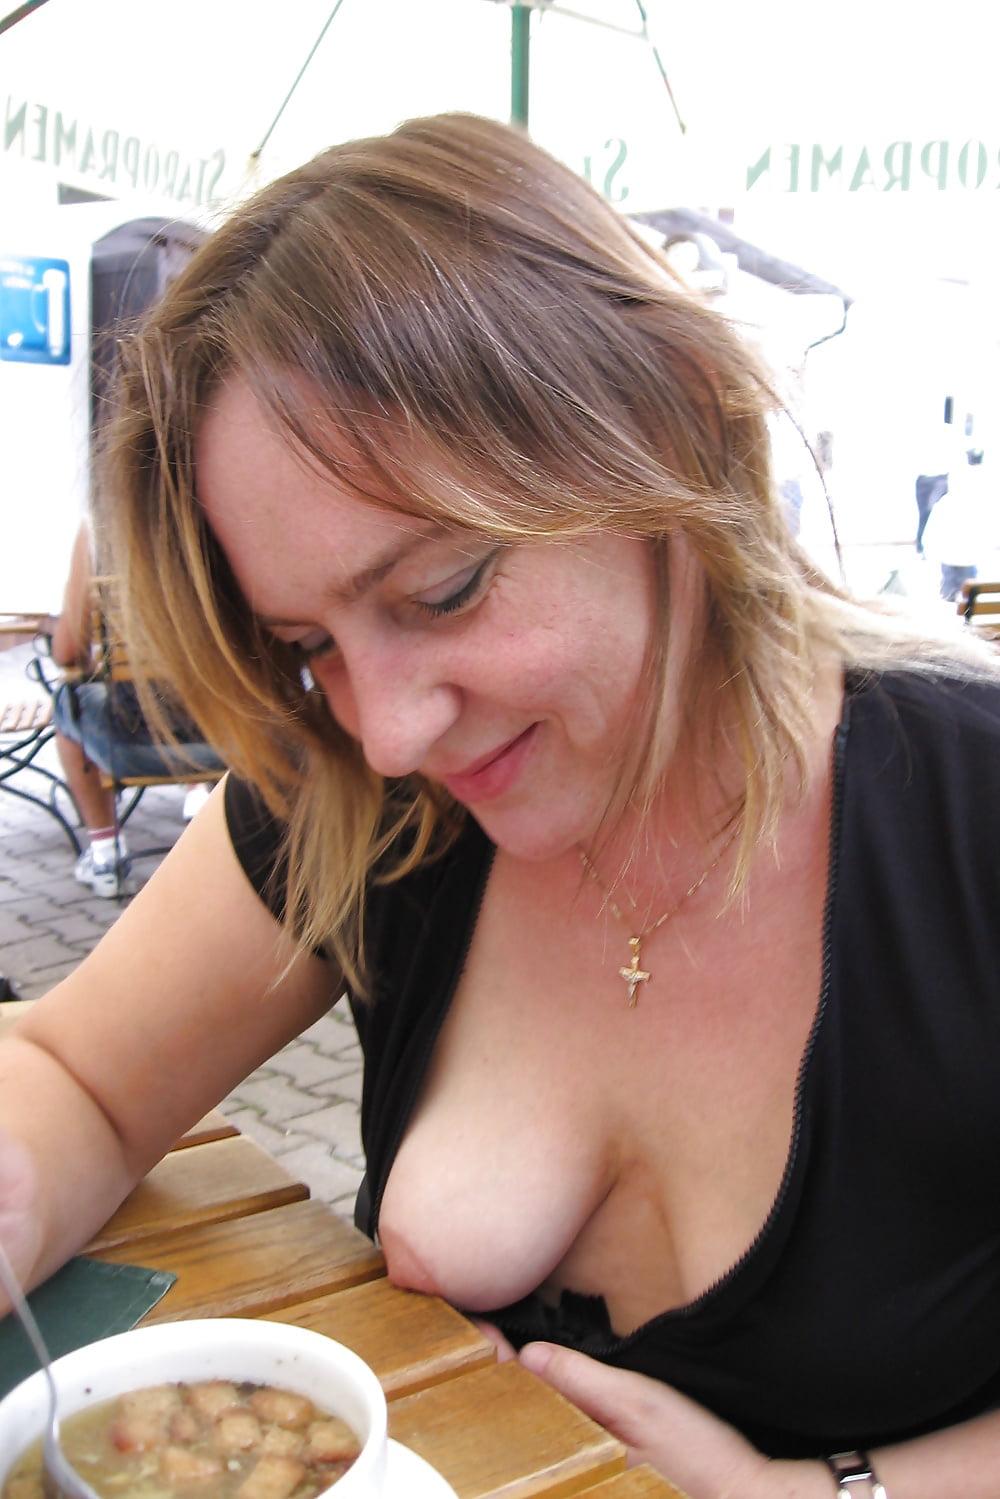 Wife nude nip slip — photo 8